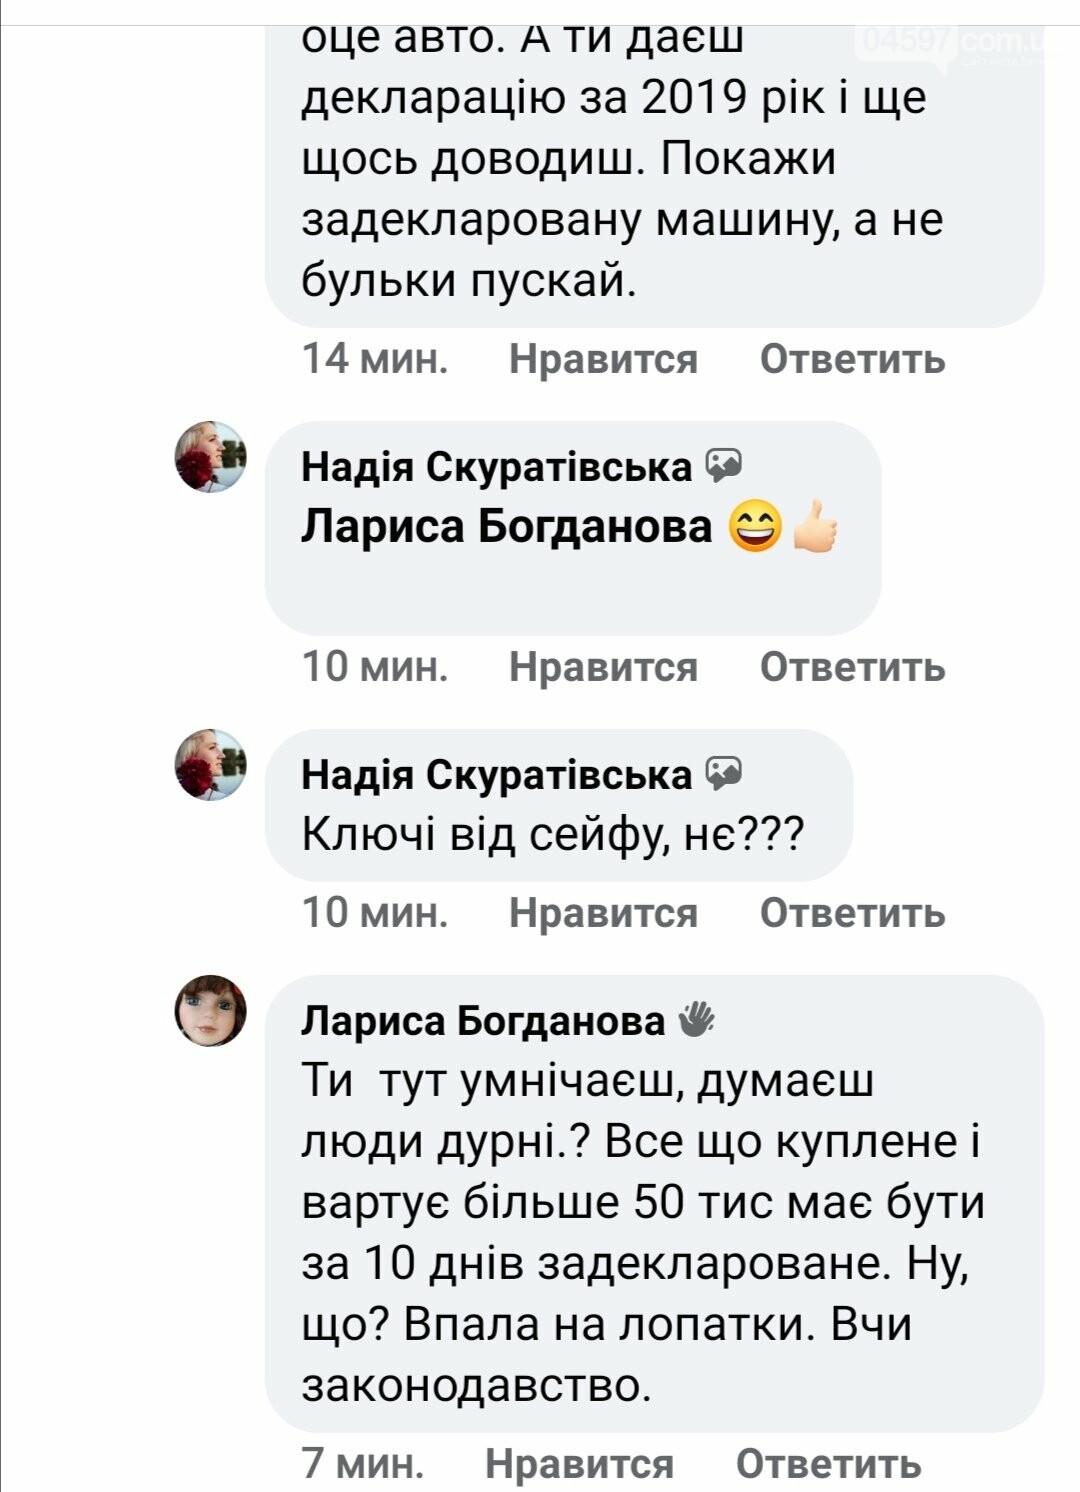 Донька мера Гостомеля купила авто за 100 тисяч євро, фото-5